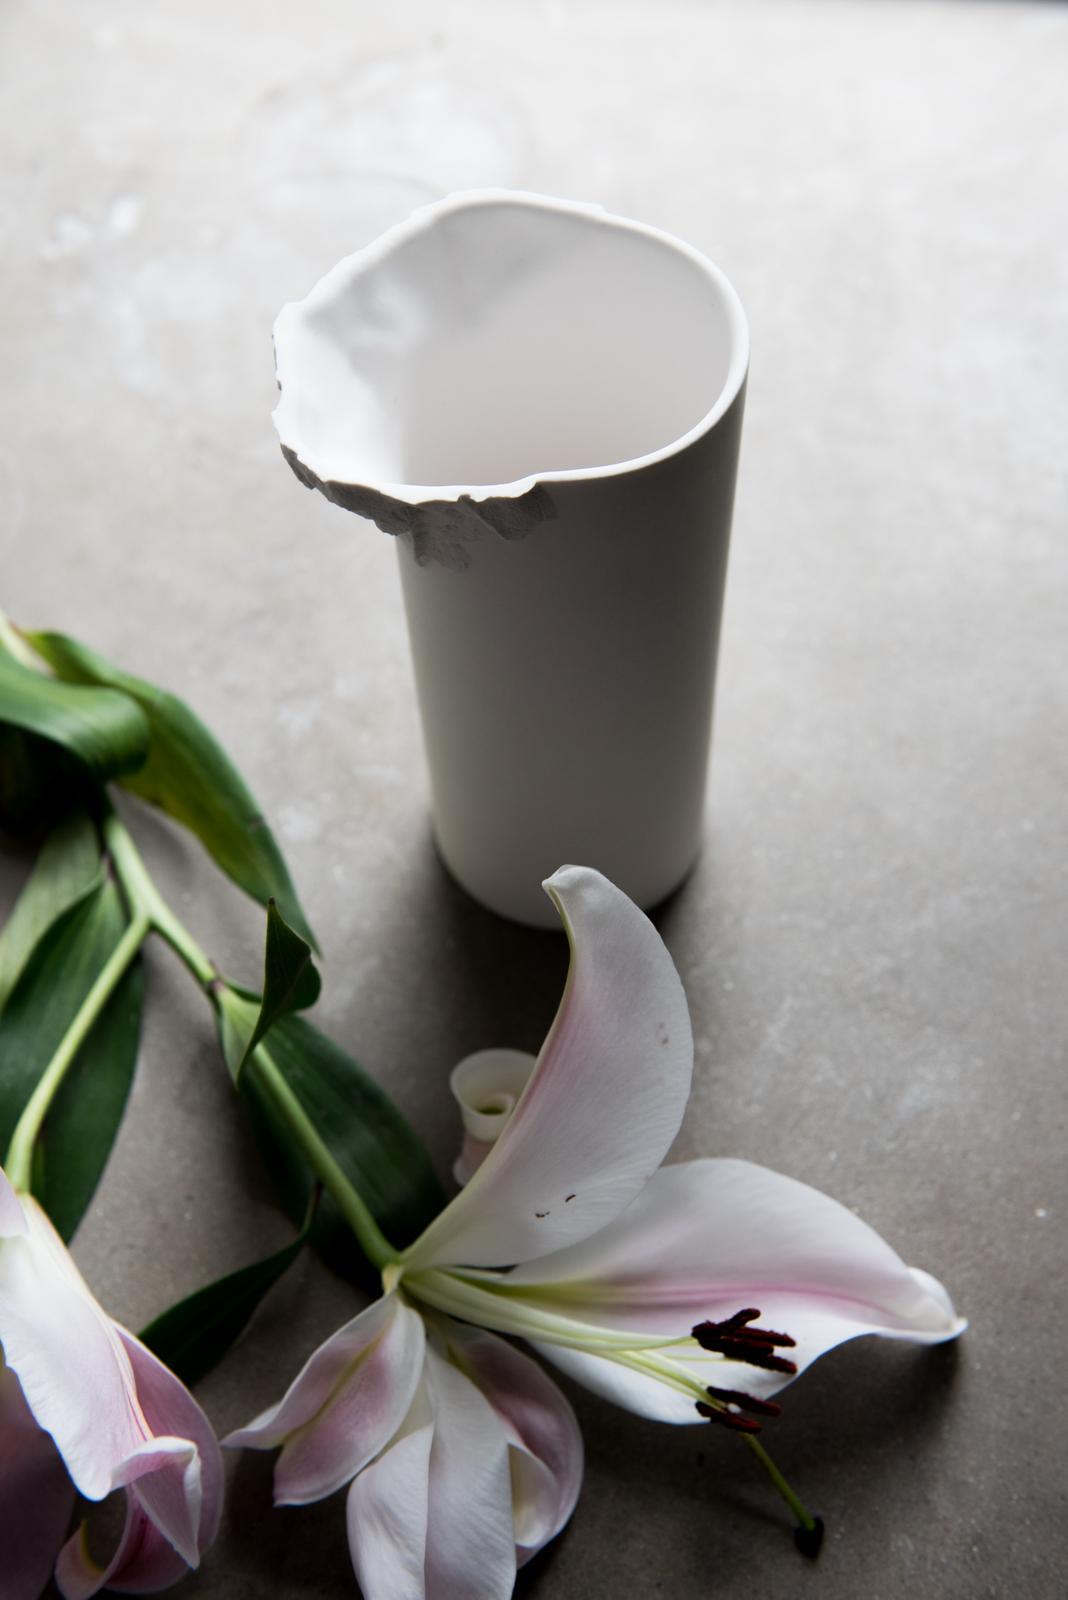 Porcelain Vase - Ian McIntyre. Originally designed in 2008 - redesigned in 2016 for M&R. Made on Bornholm